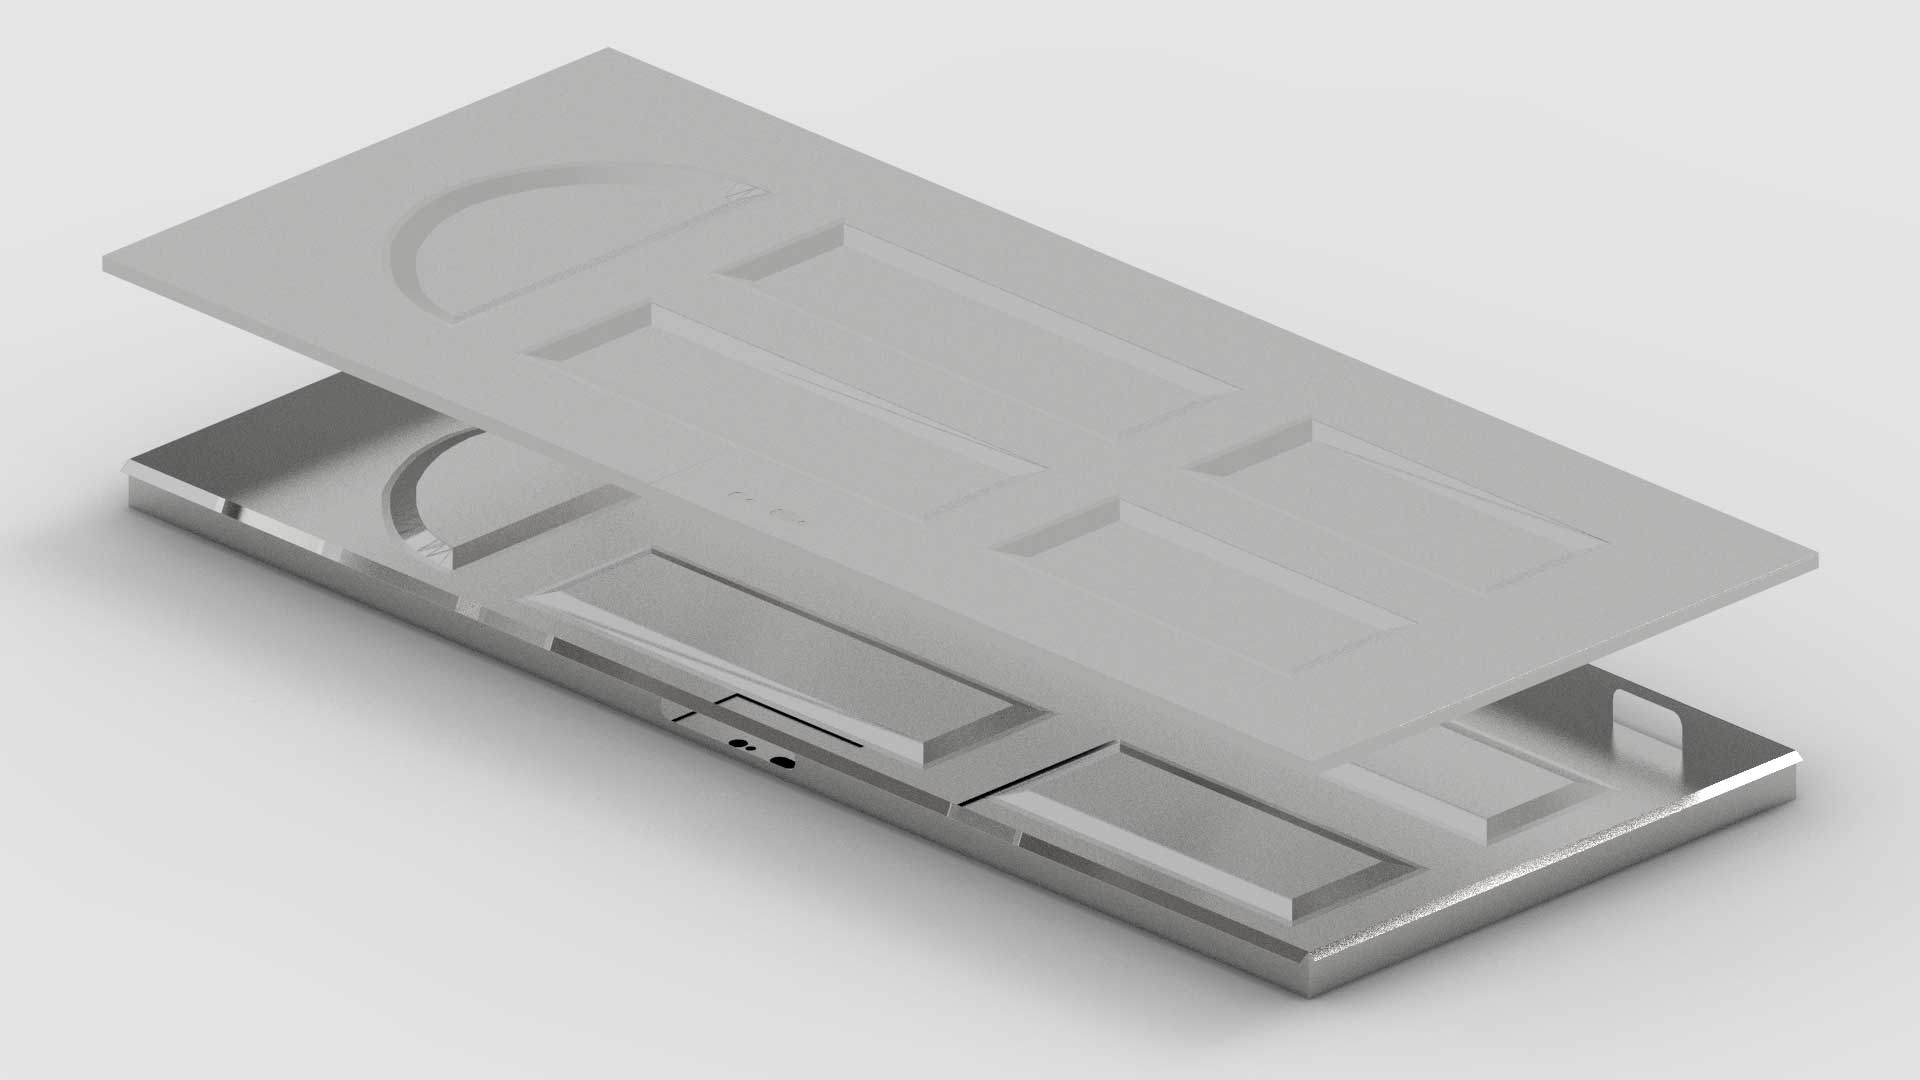 steel-doors-box-cover-product-1.jpg